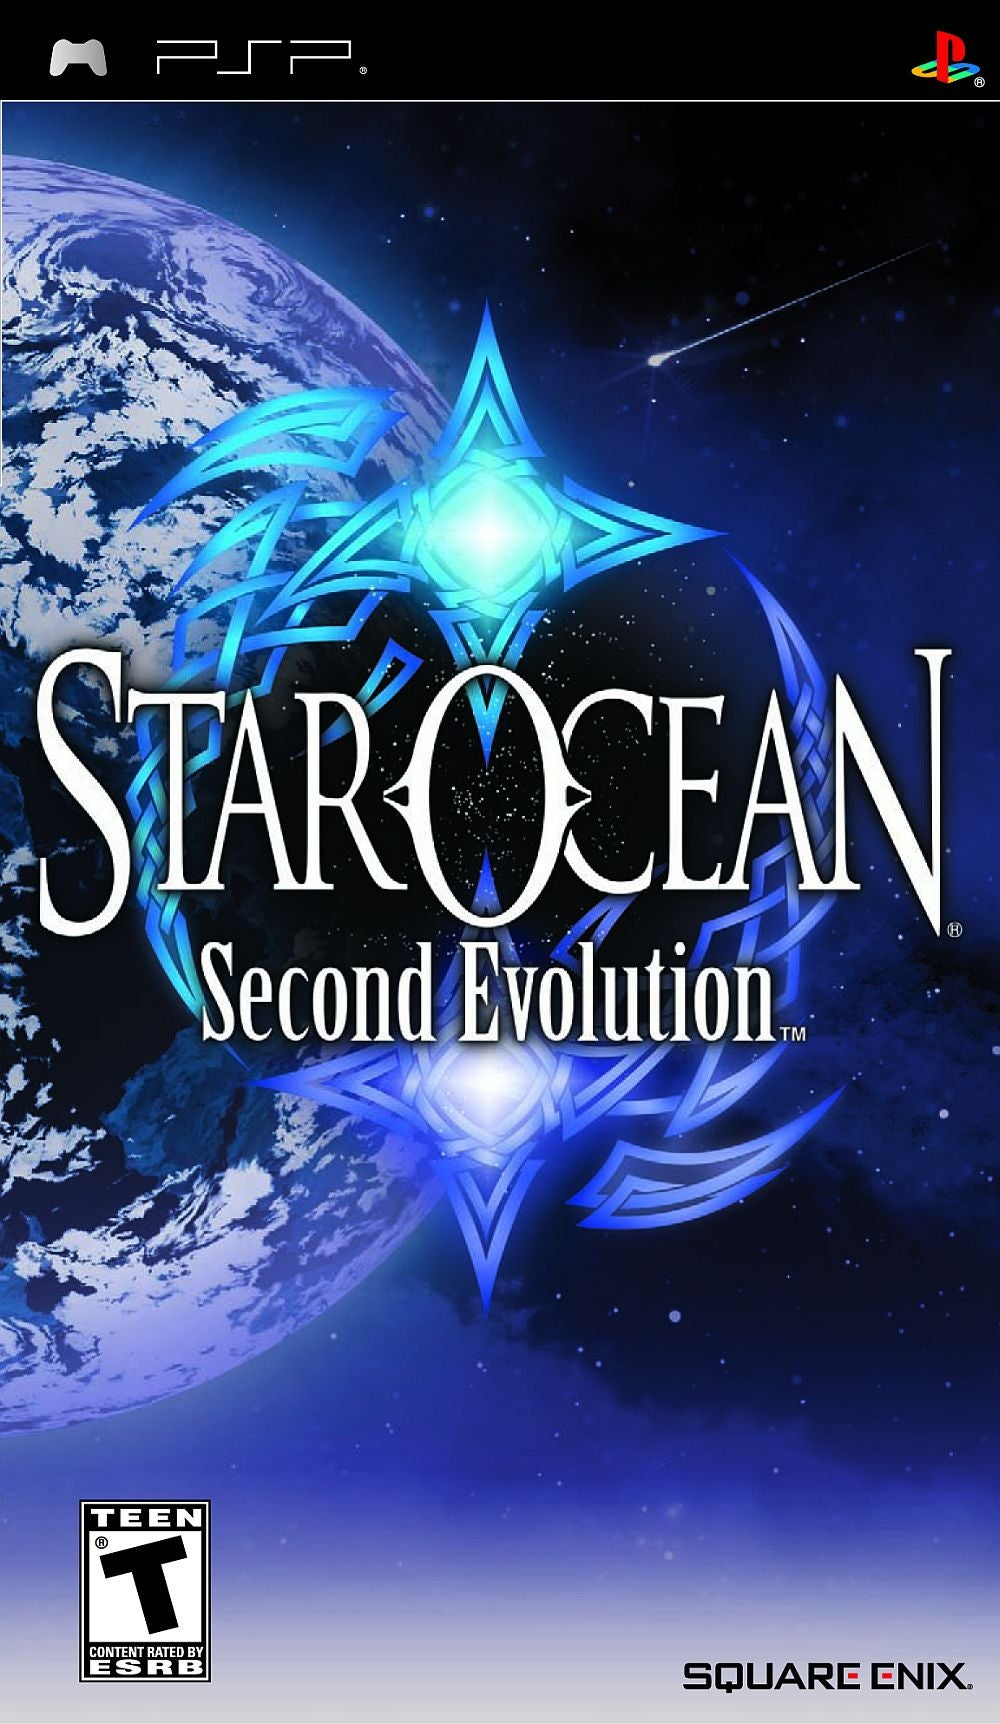 https://i2.wp.com/pcmedia.ign.com/pc/image/object/905/905545/star-ocean-2_PSP_US_ESRB.jpg